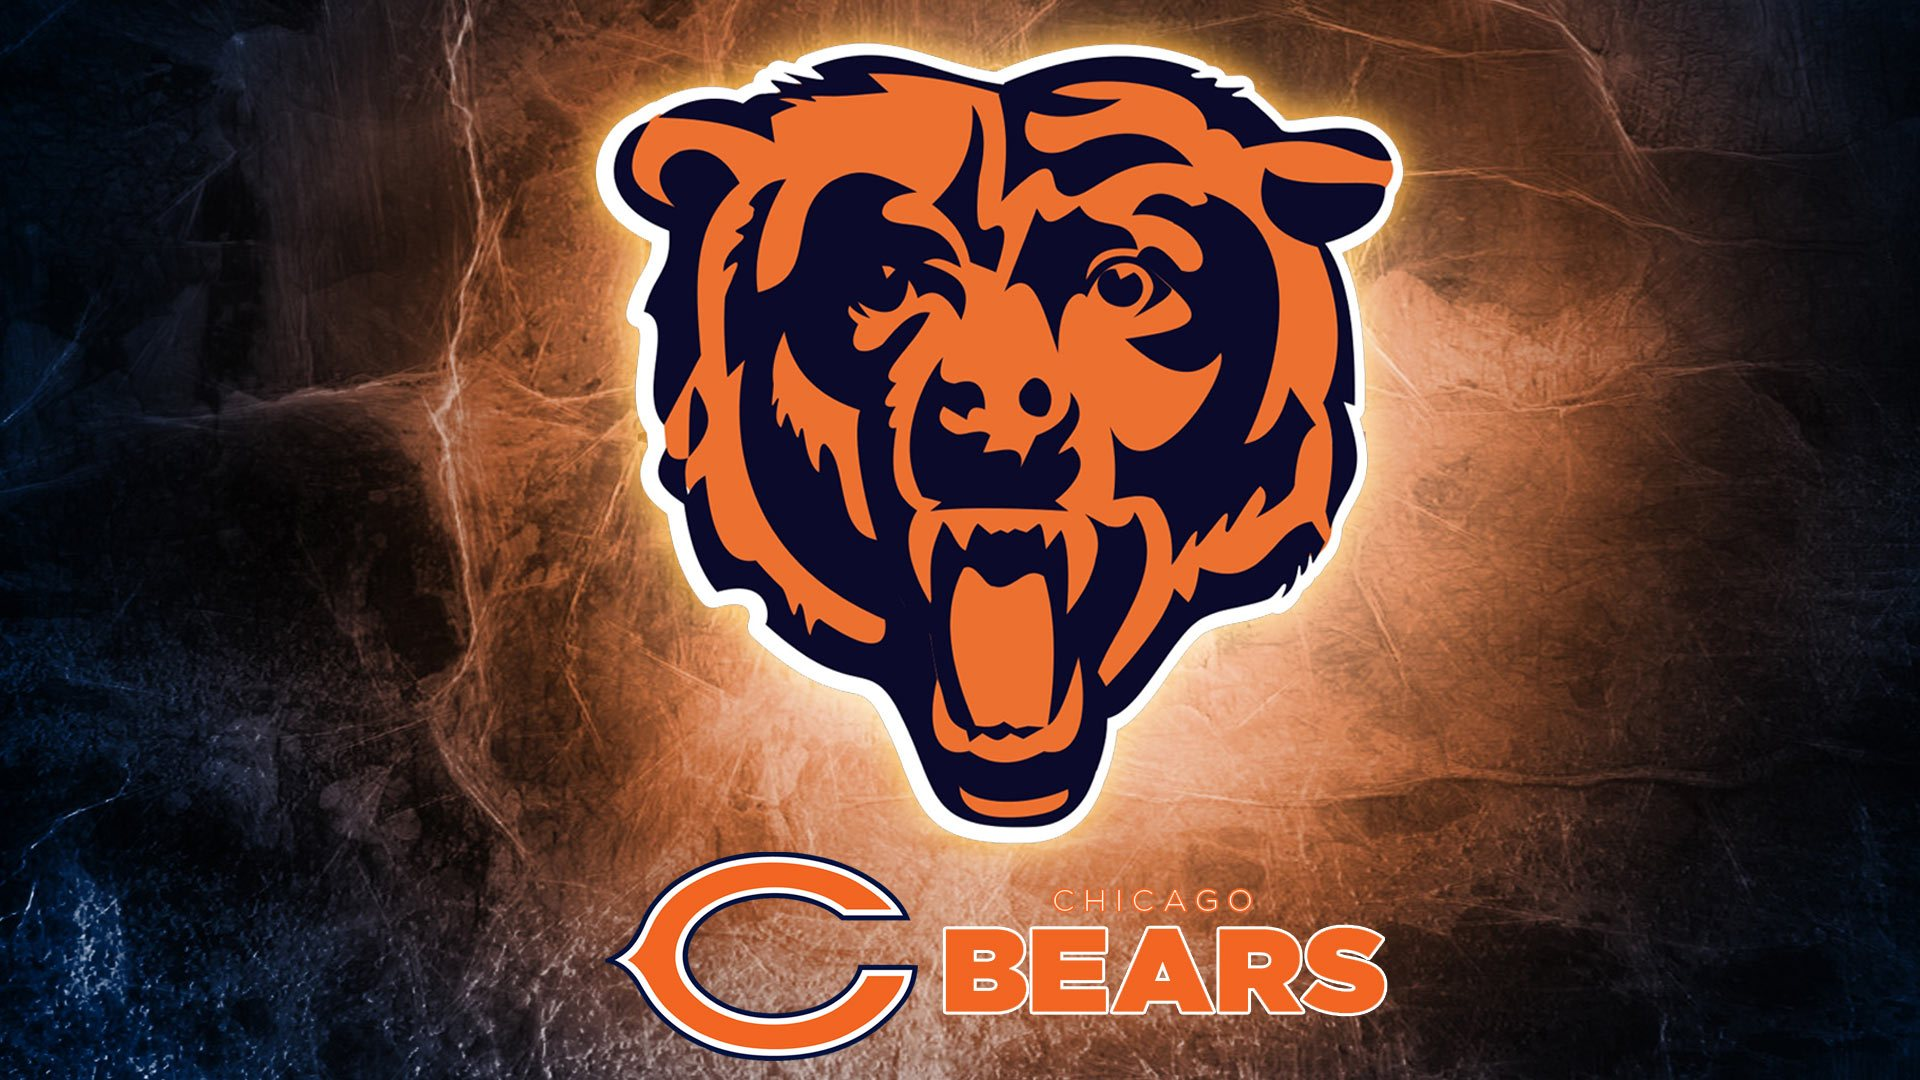 HD Chicago Bears Wallpaper 1920x1080